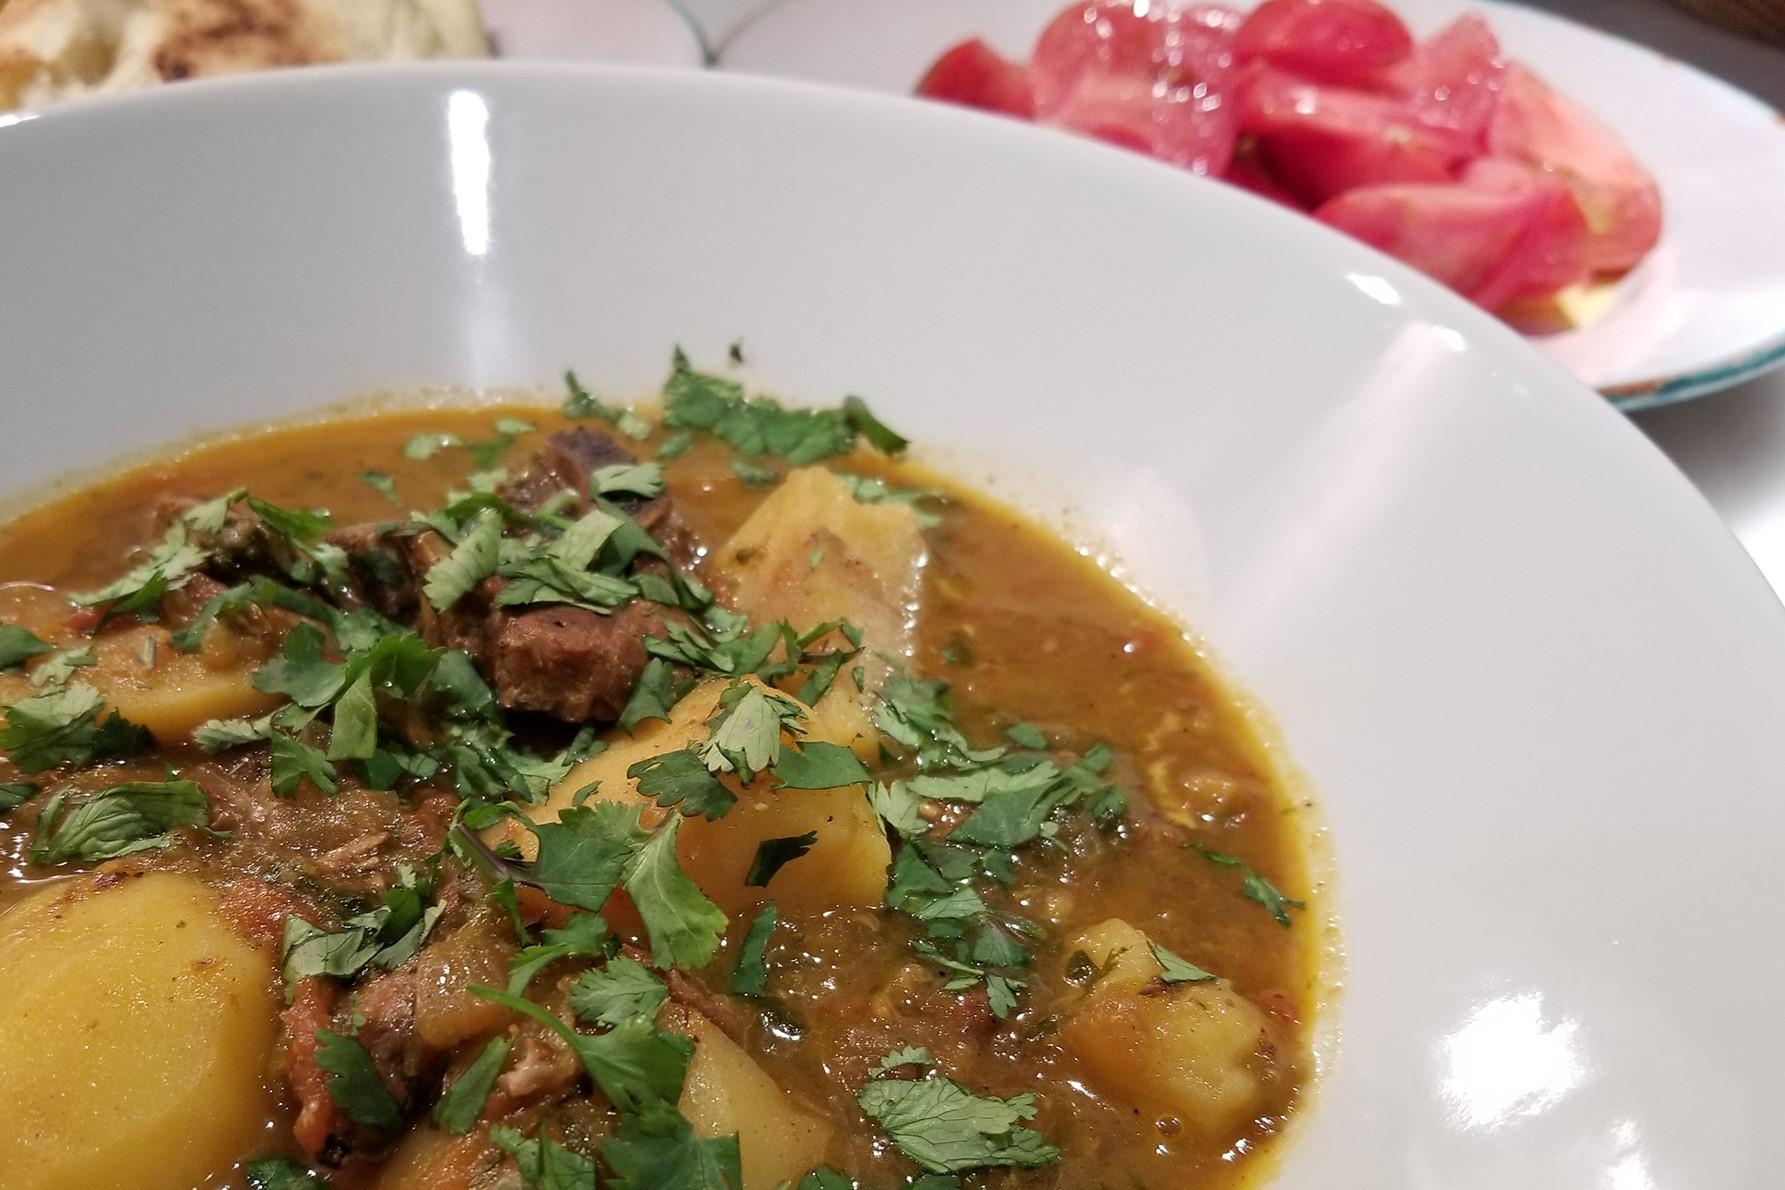 My version of marak temani, a traditional Yemeni dish.